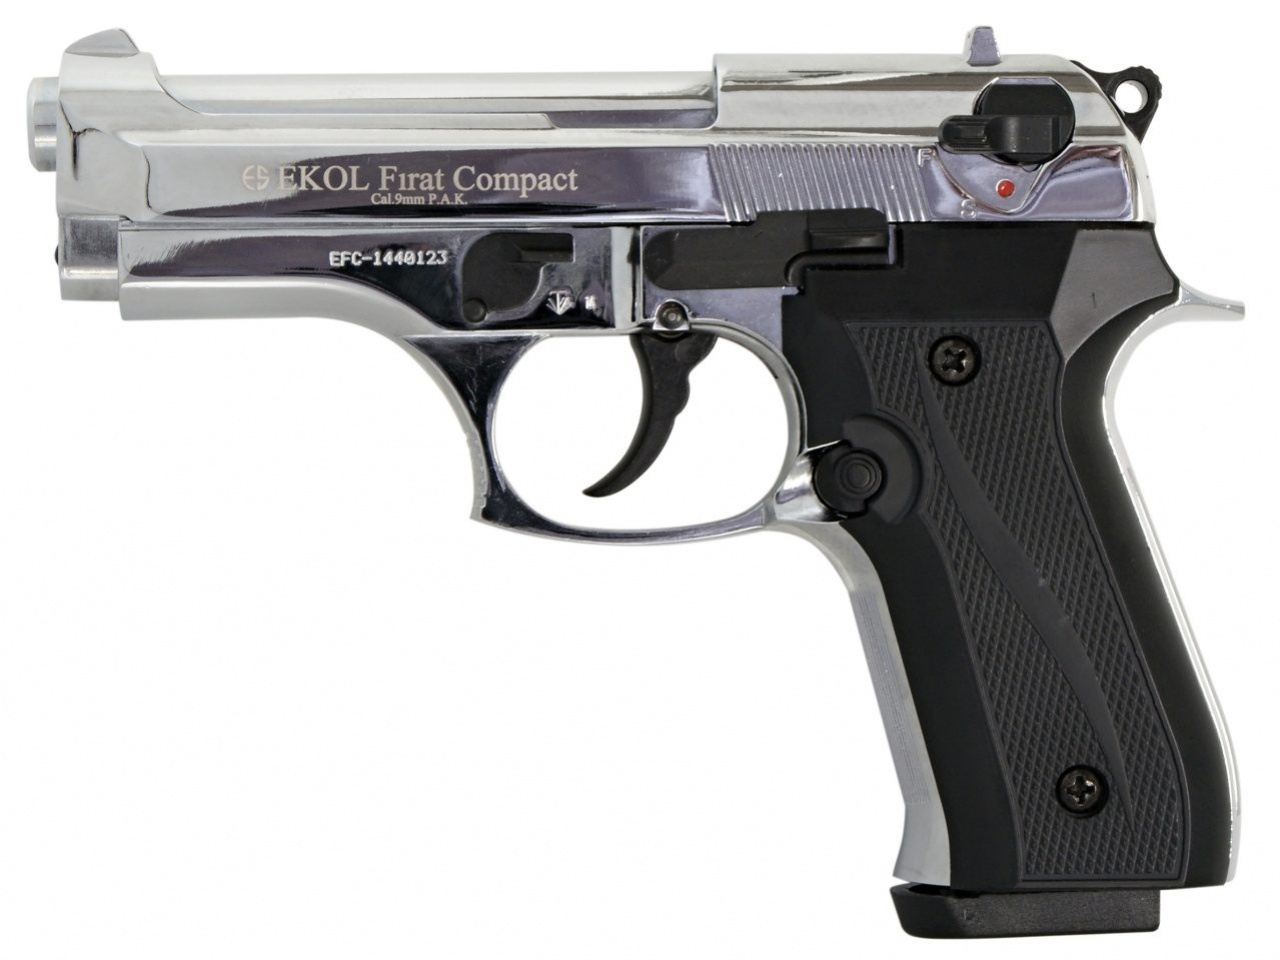 Plynová pistole Ekol Firat Compact chrom cal.9mm